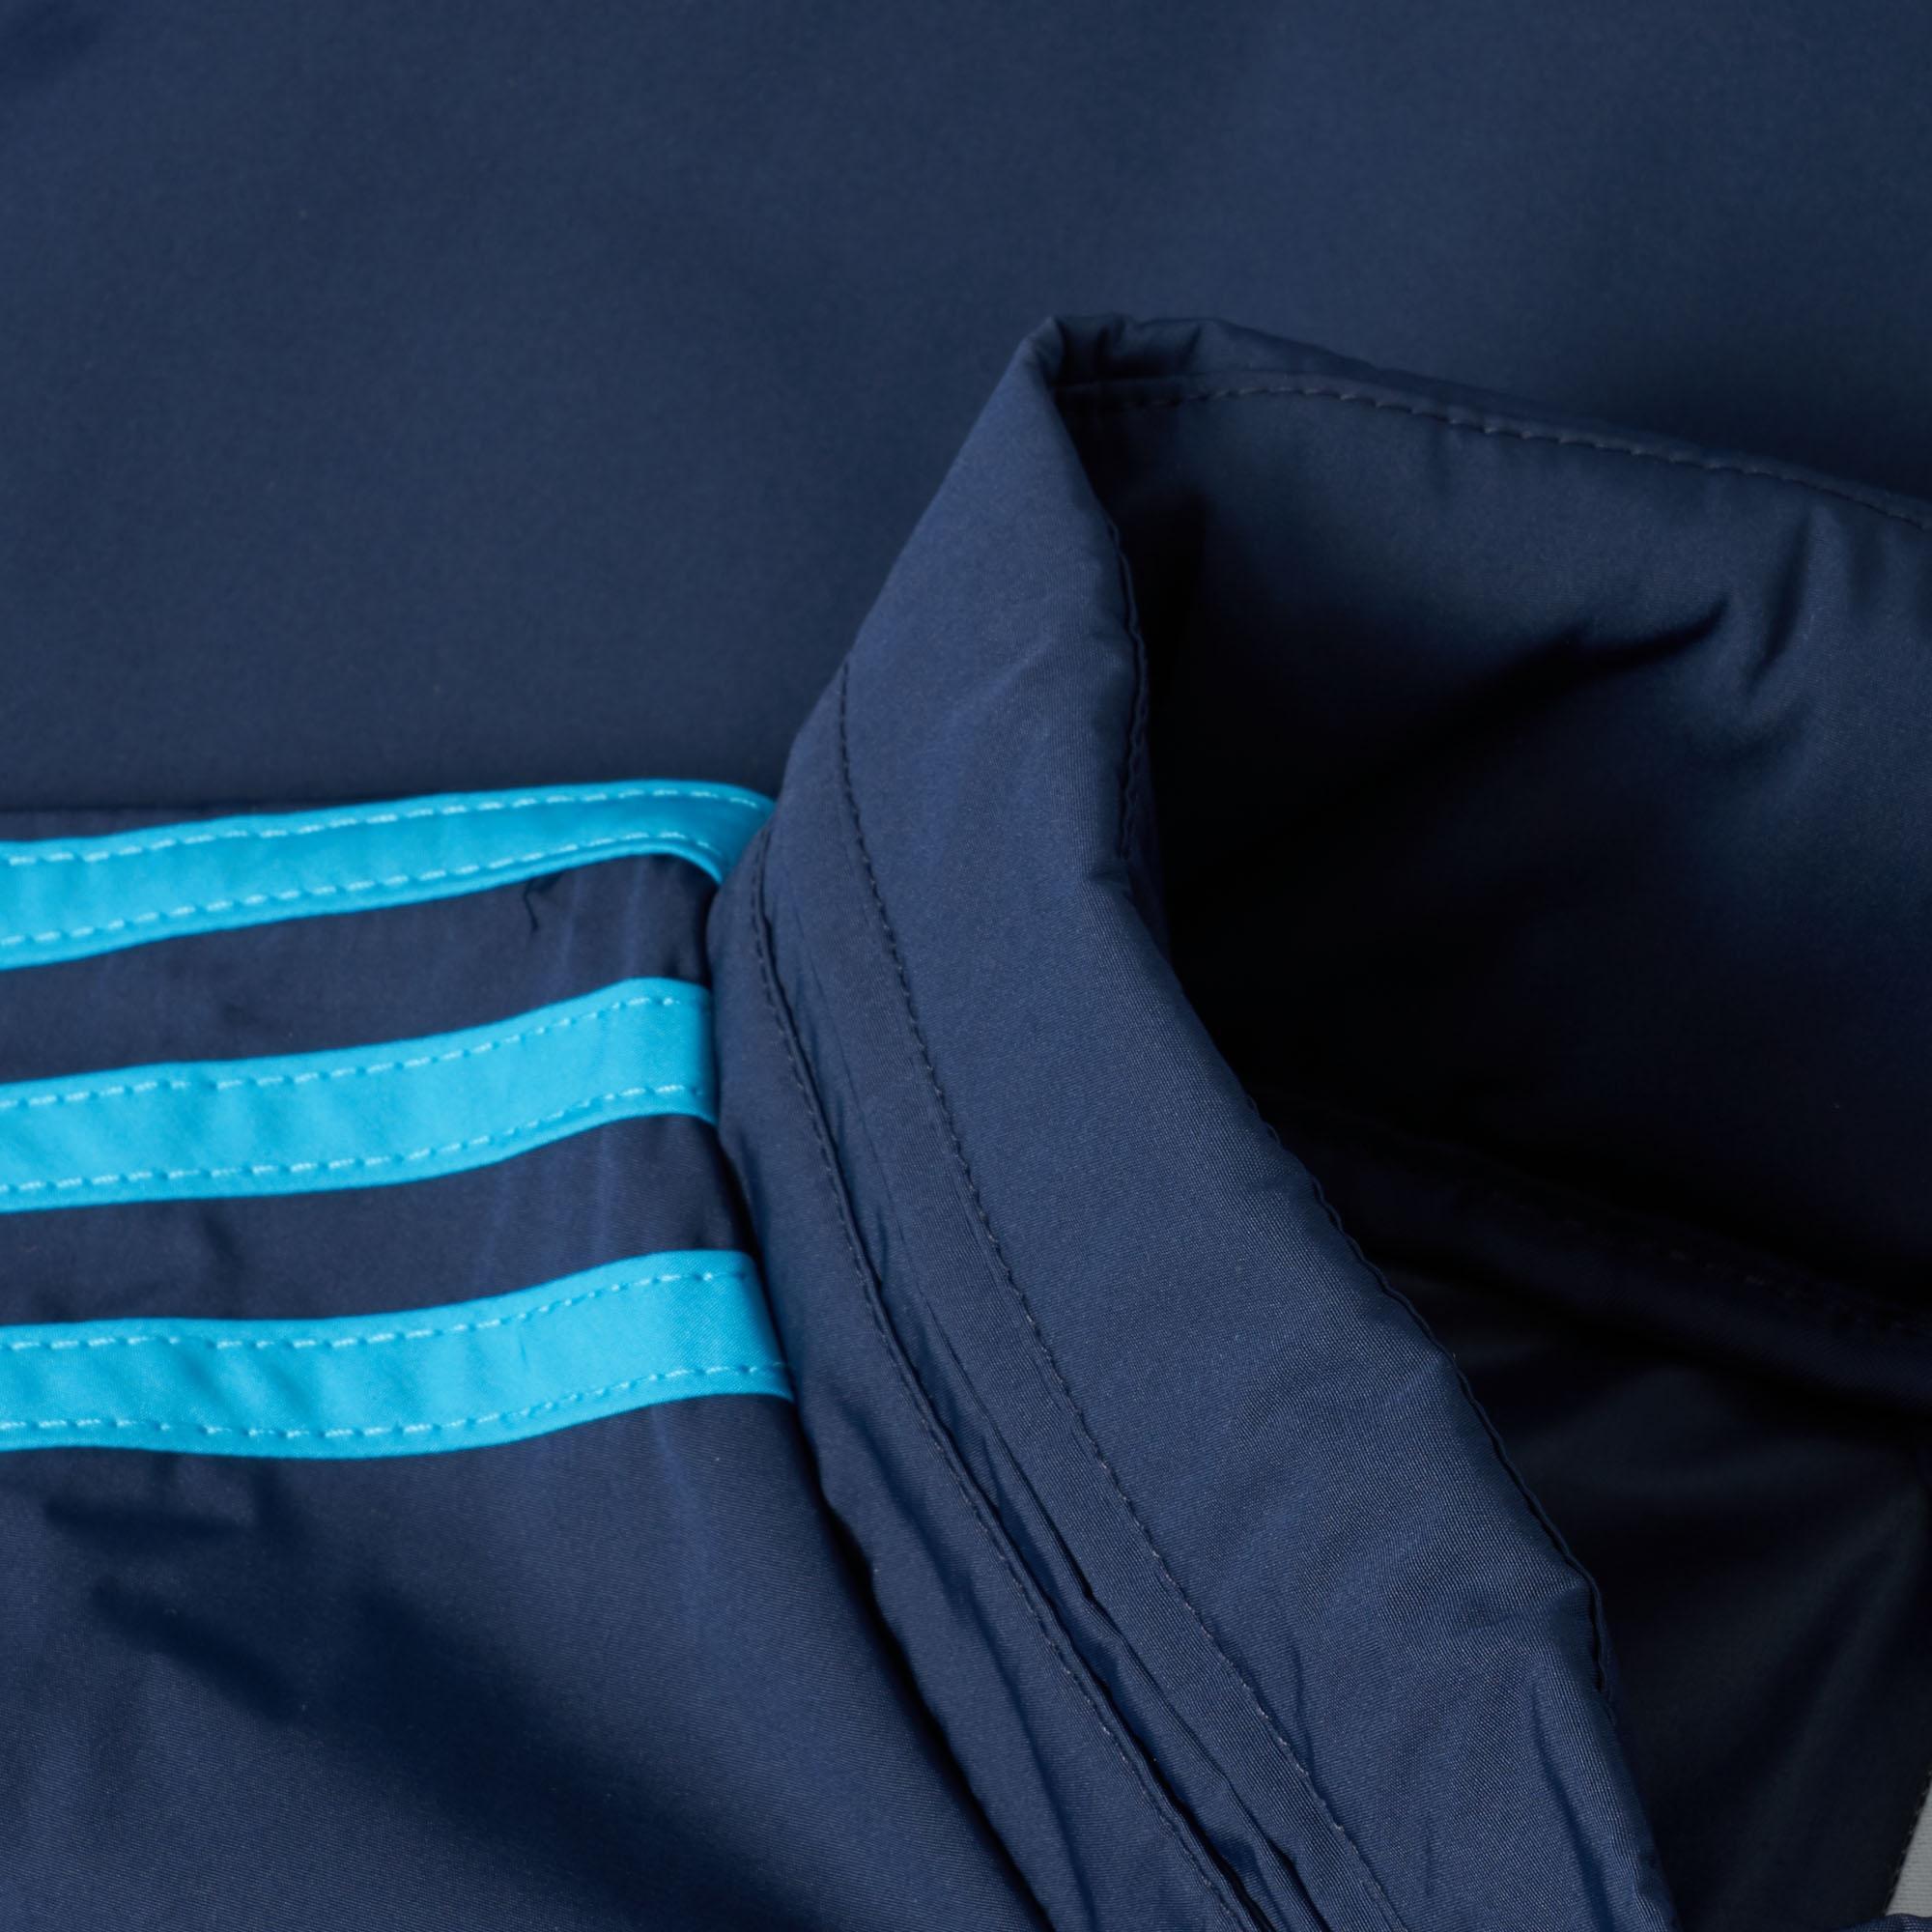 49ce558259 ... Palmeston Windbreaker - Collegiate Navy   Bold Aqua for Men - Lyst.  View fullscreen